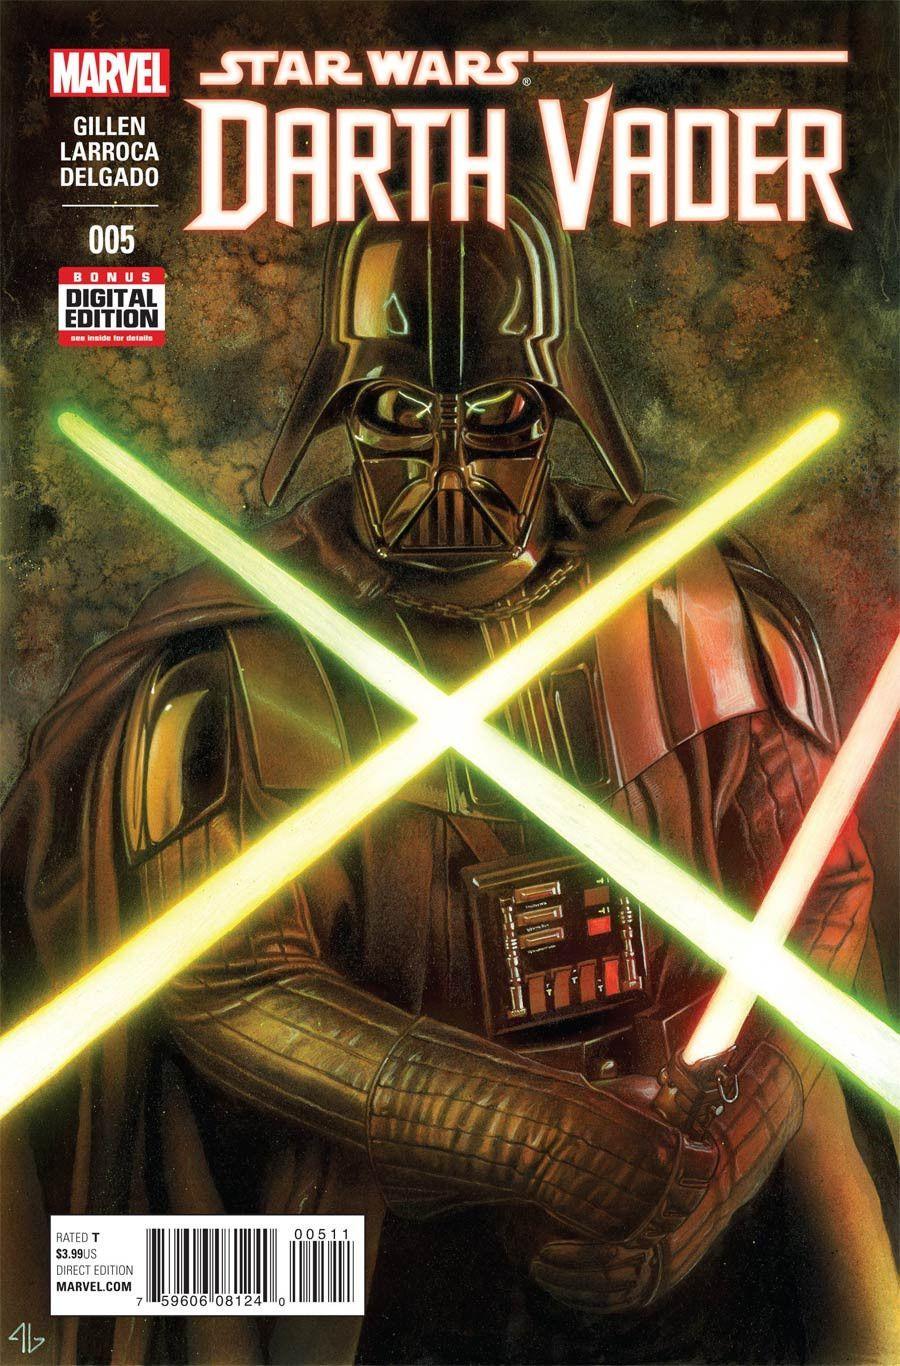 DARTH VADER #5 MAY 2015 MARVEL COMIC BOOK NEW RIVALS STAR WARS EMPERIOR SECRETS